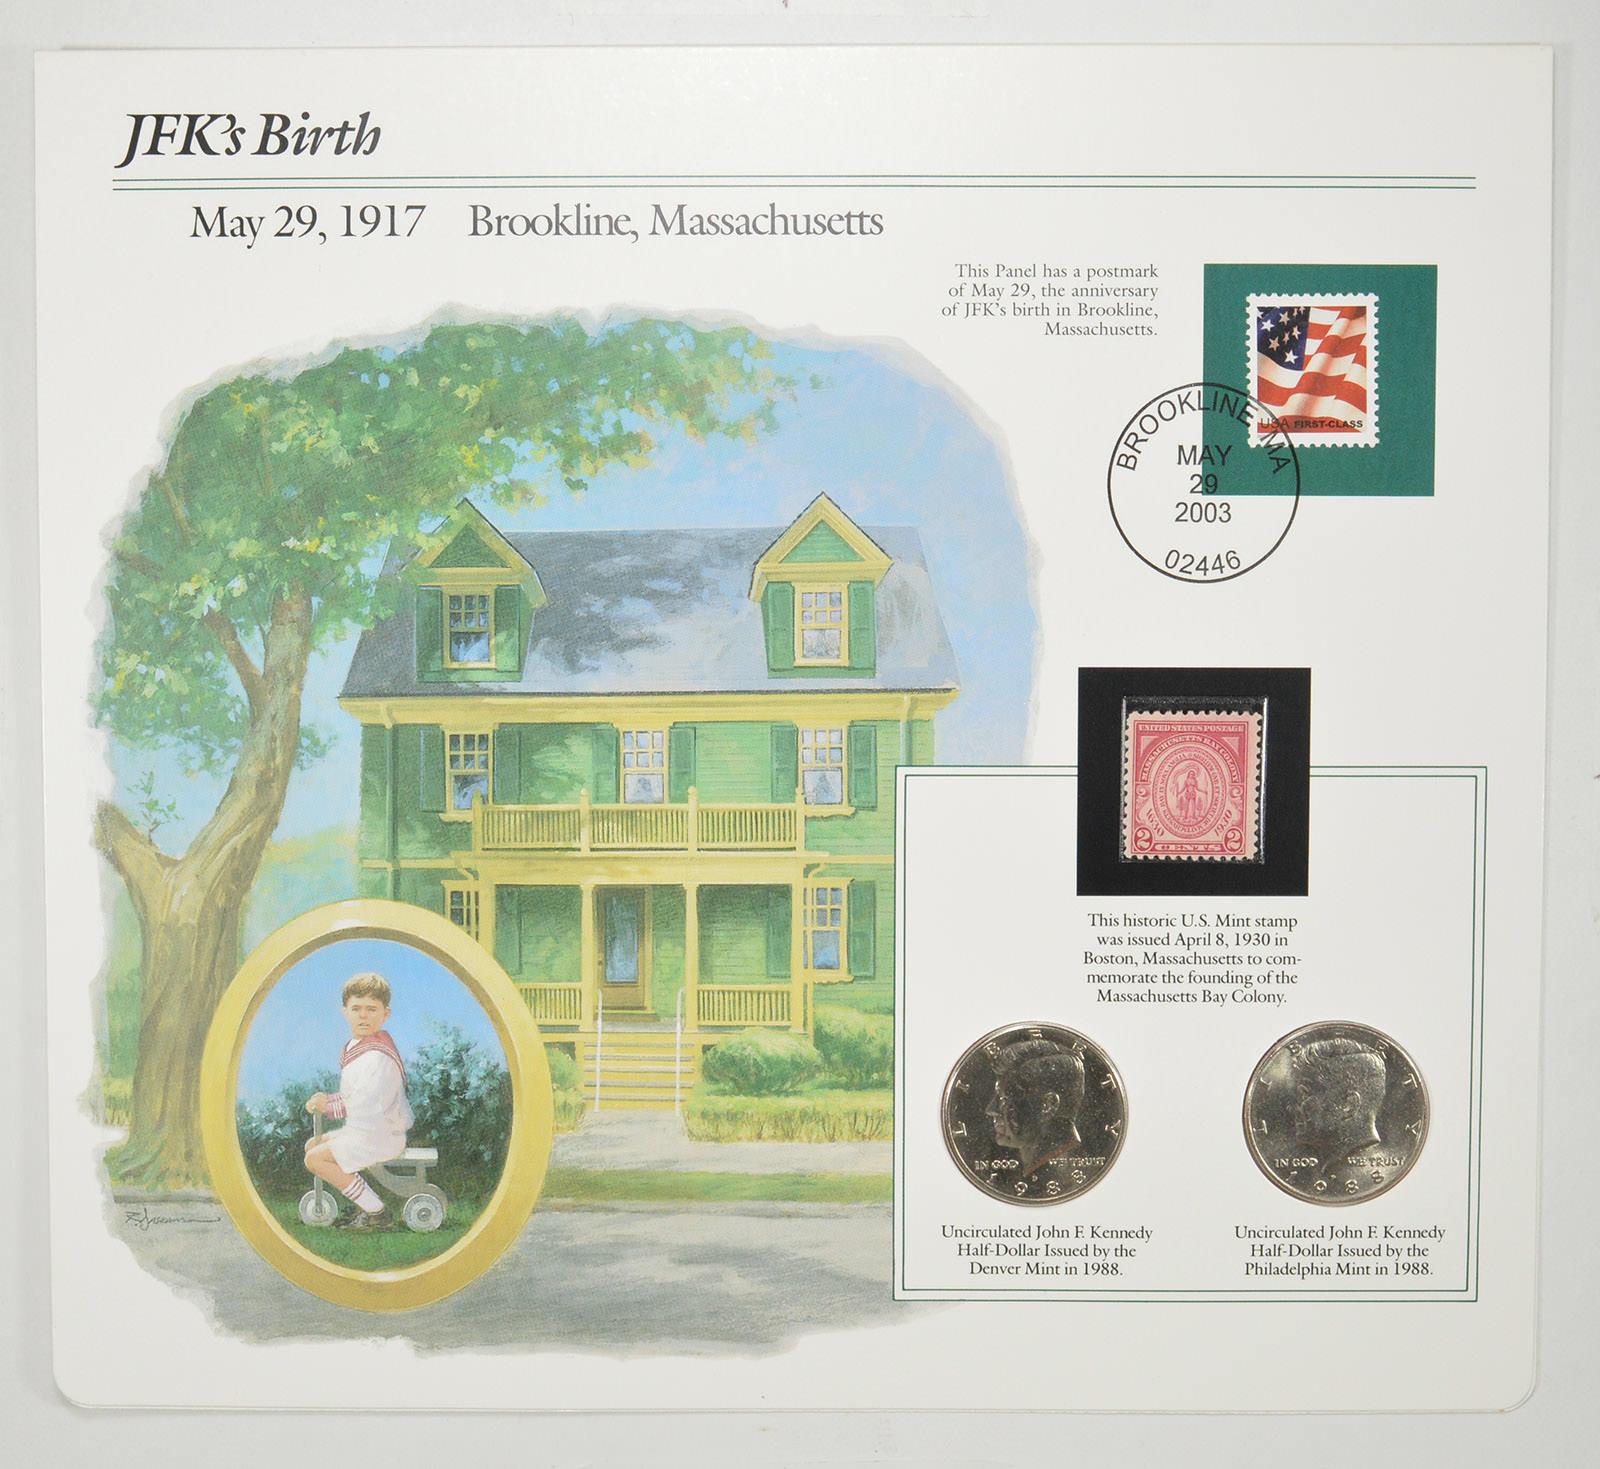 1988 P D Kennedy Half Dollars BU US Mint Cello 2 Coin Set